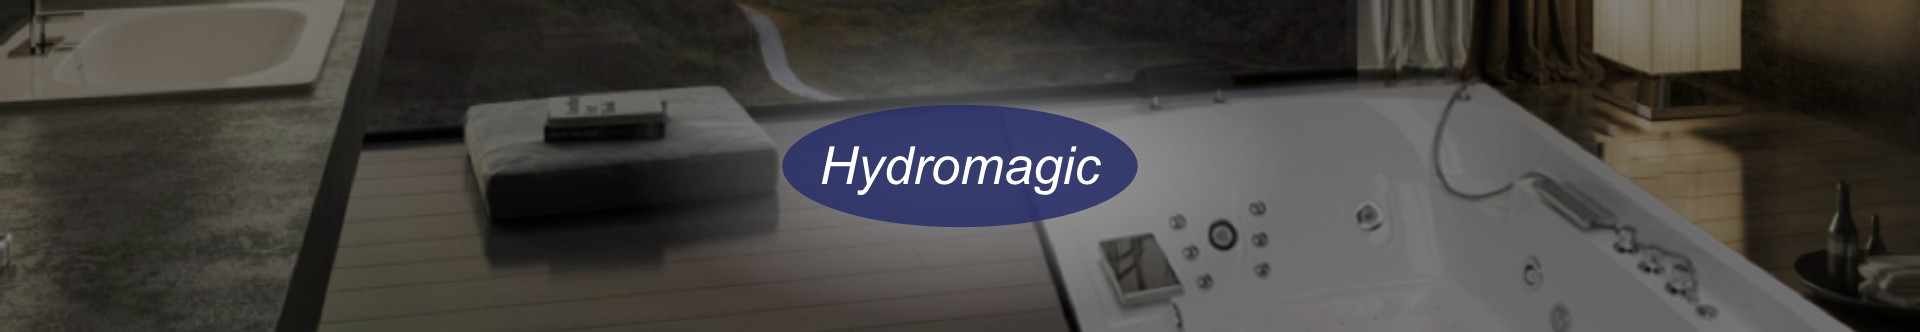 marcas Hygolet